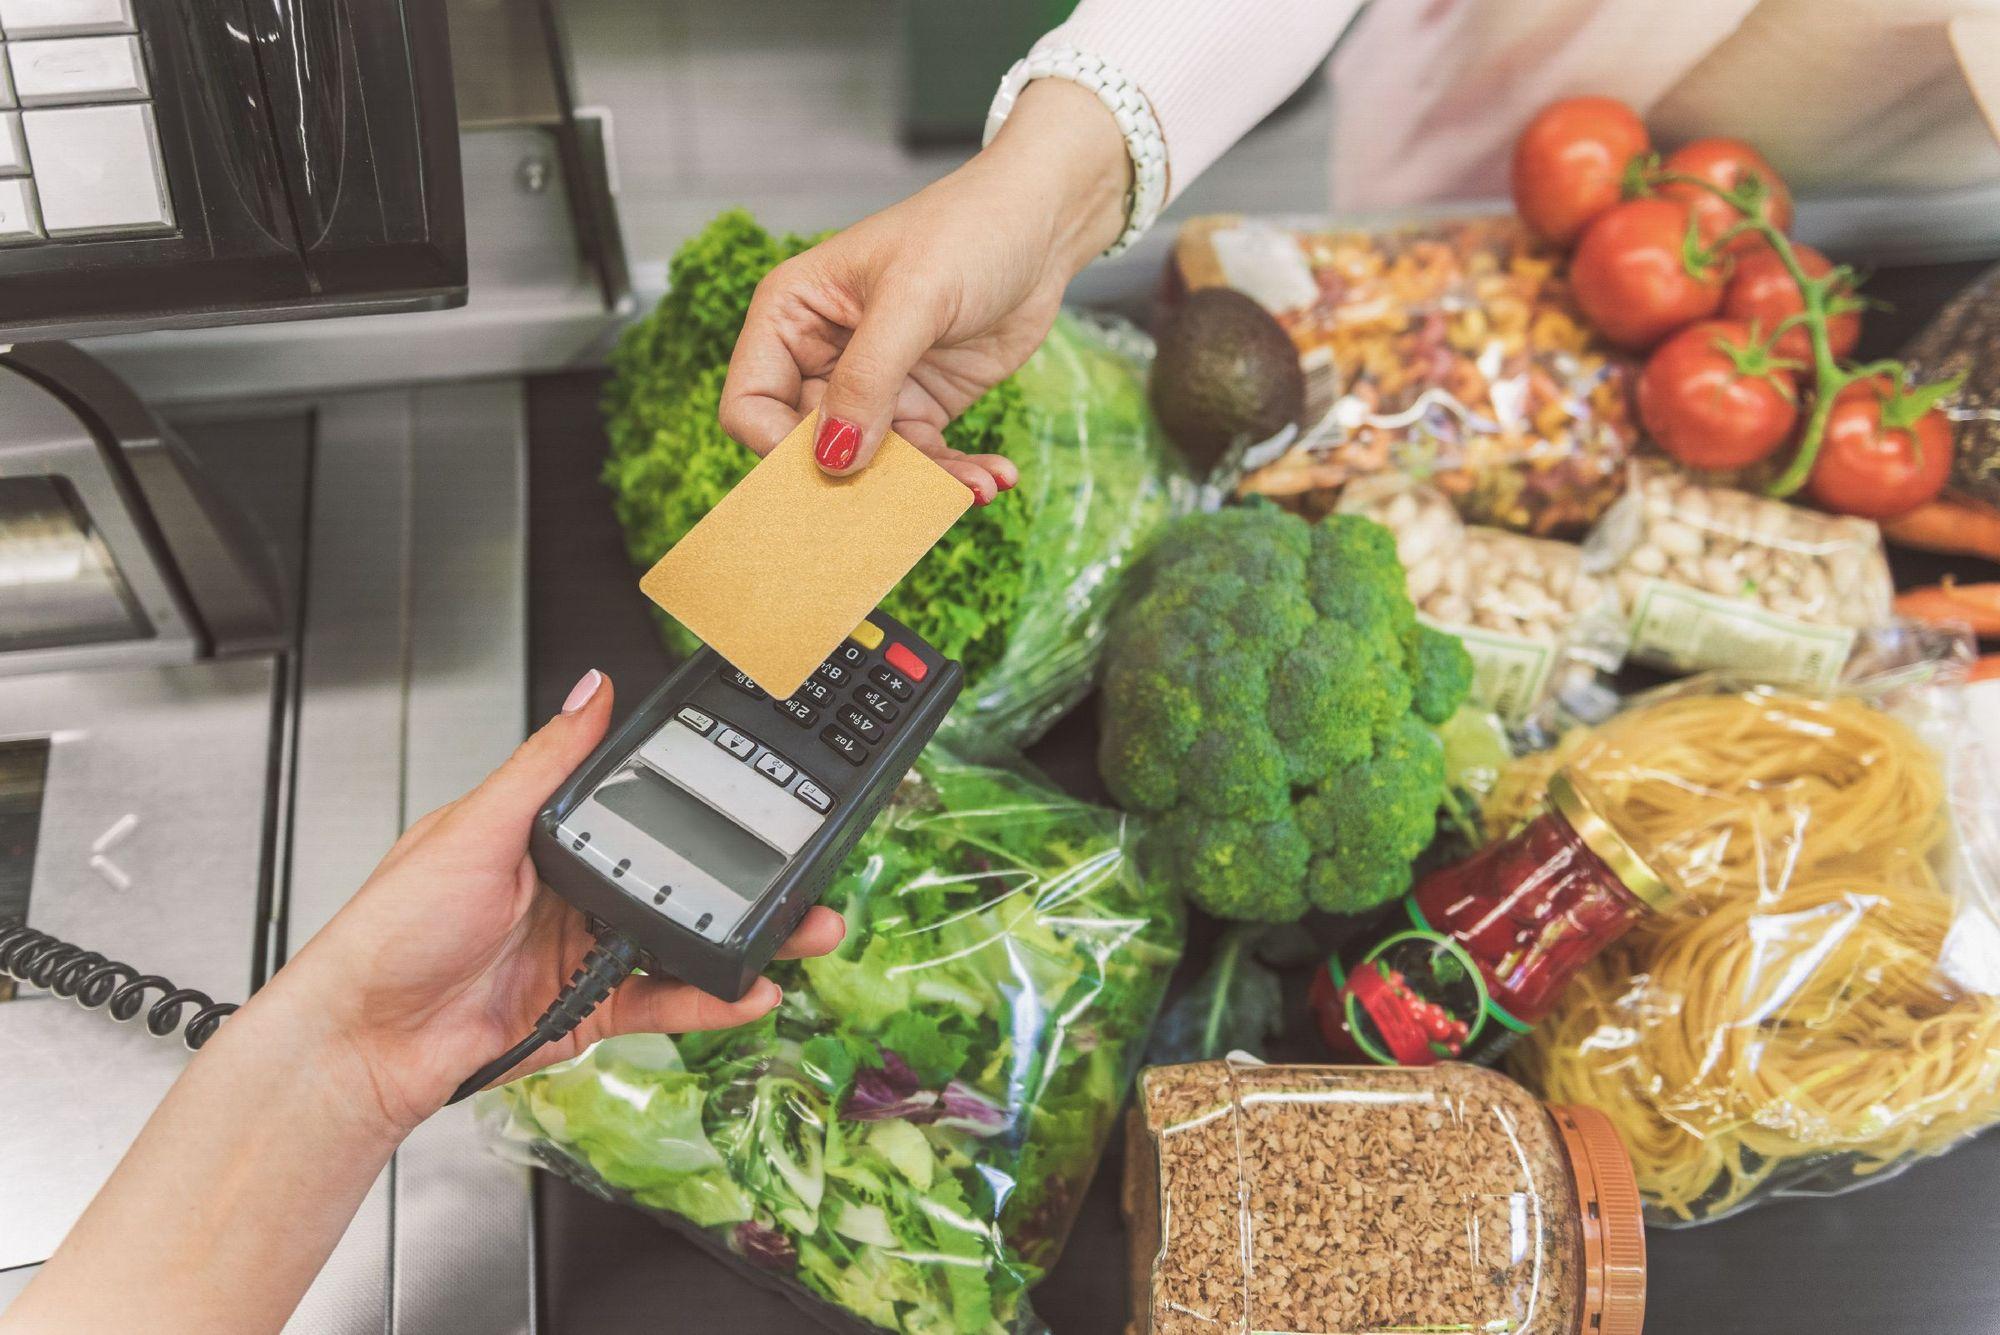 buying necessities on credit